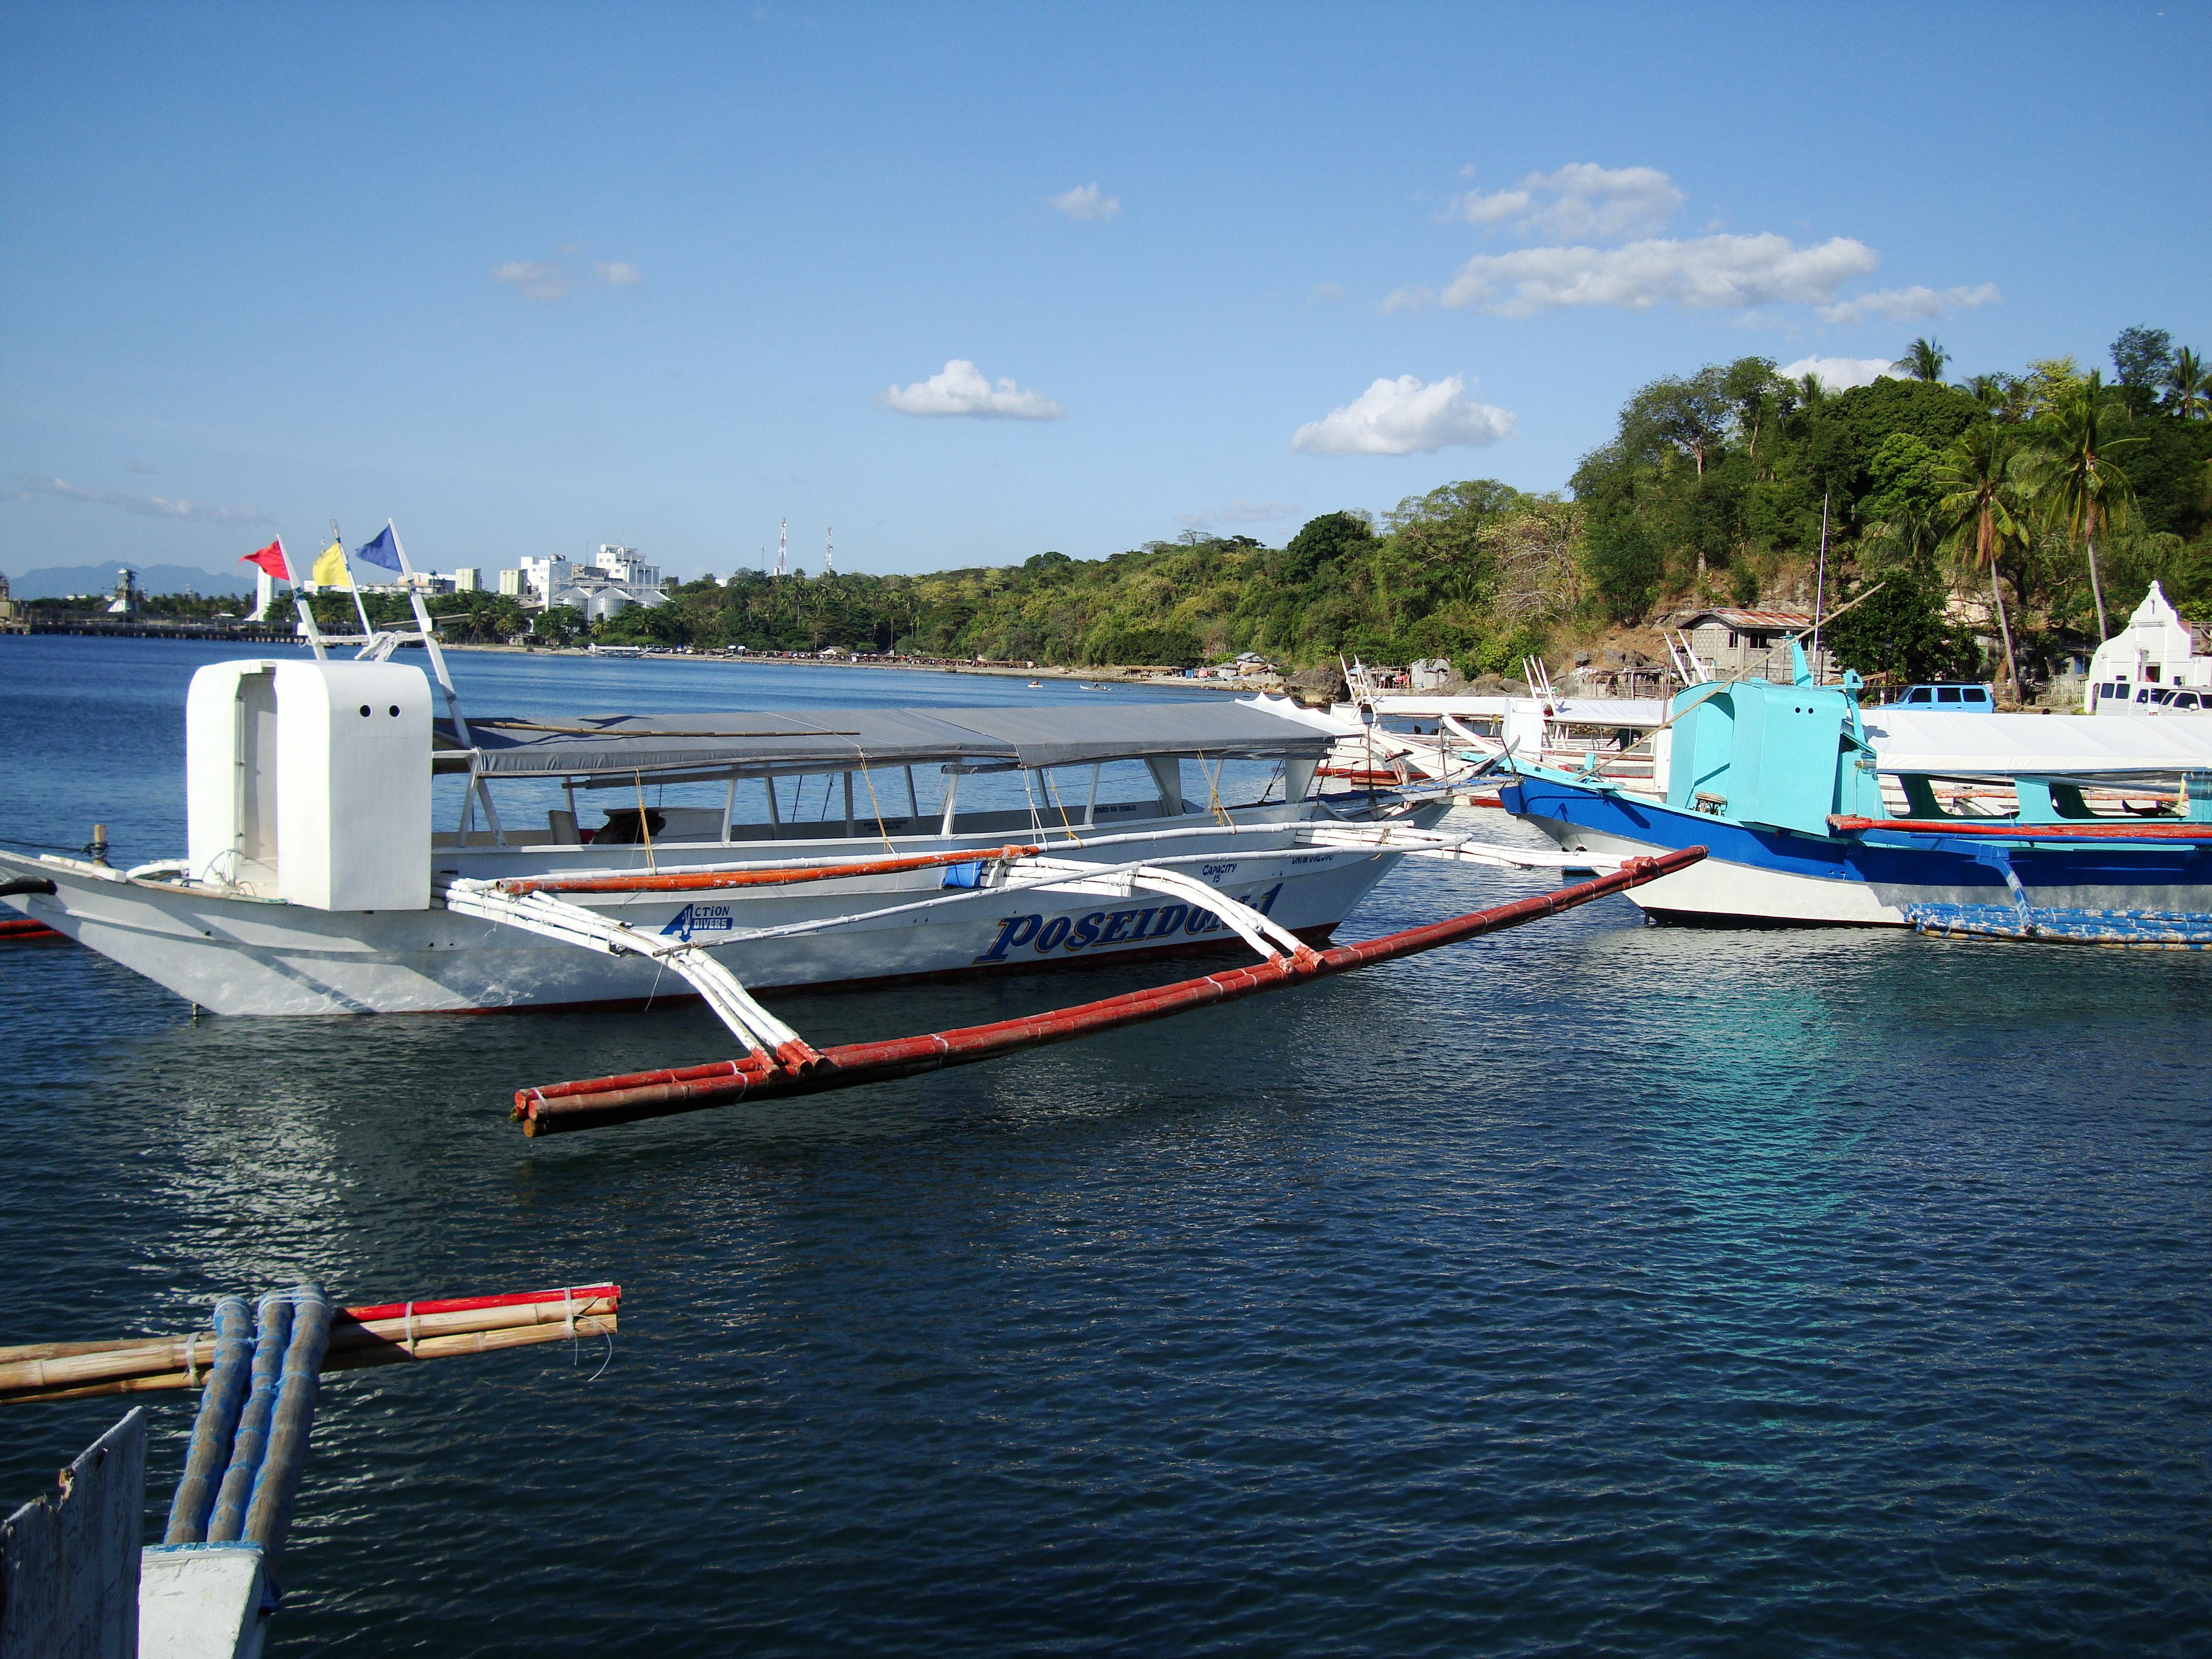 Philippine MB Banca Poseidon 1 Batangas to Puerto Galera 02